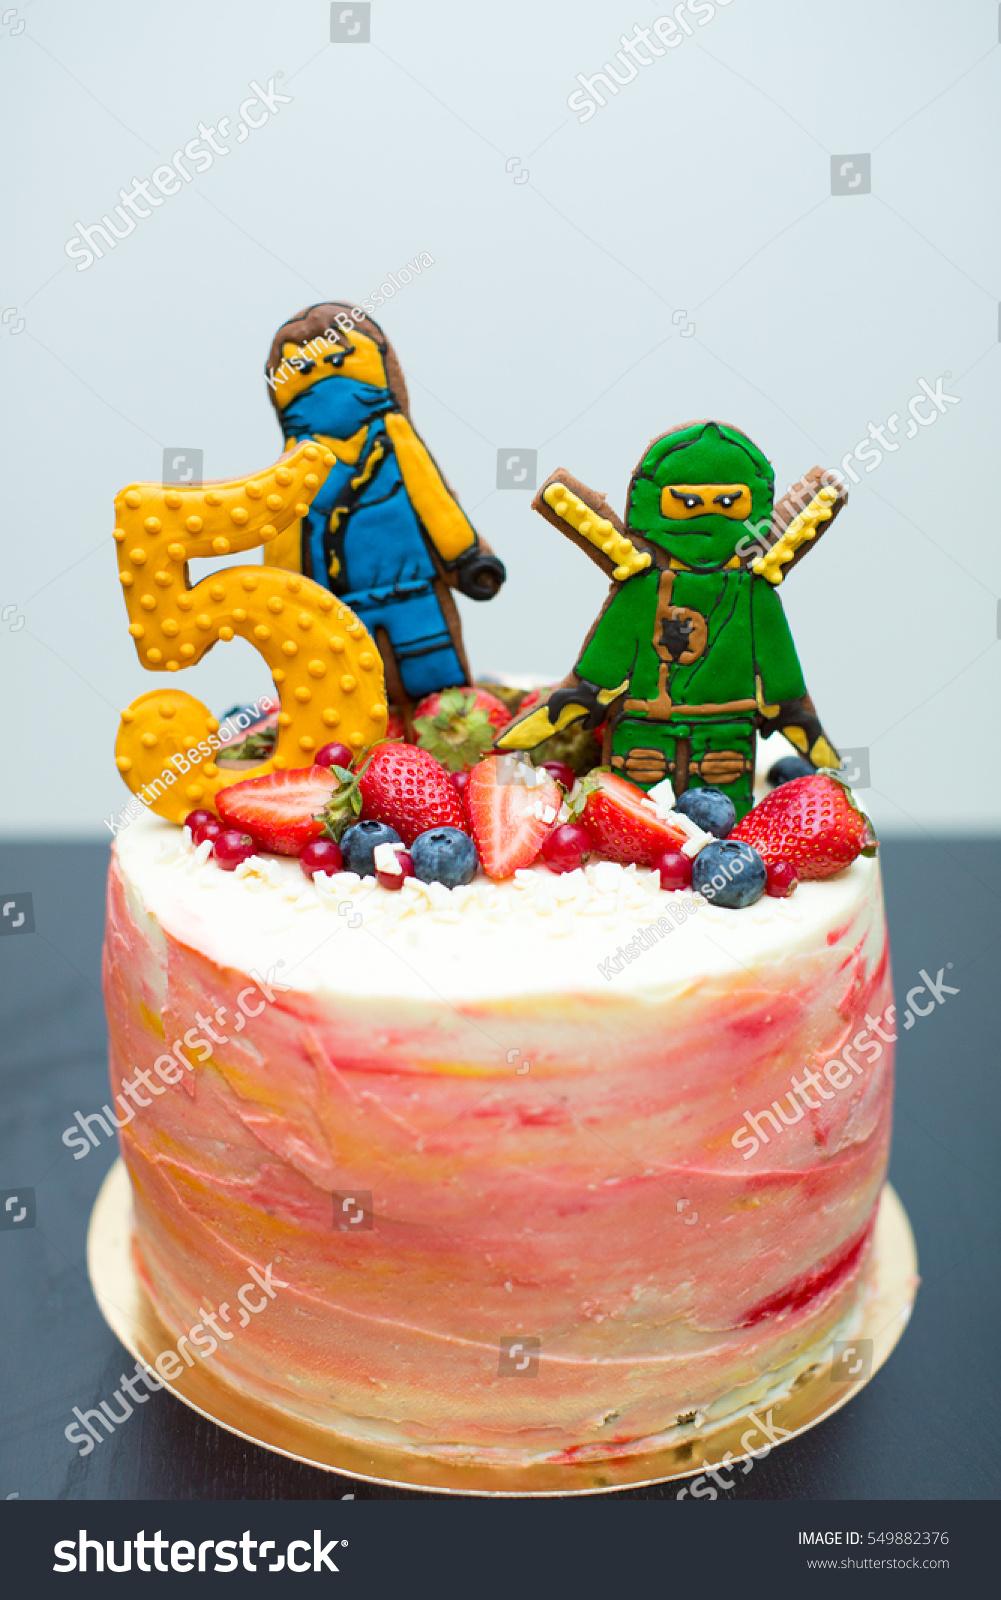 Outstanding Birthday Cake Ninjago Biscuits Berries Stock Photo Edit Now Personalised Birthday Cards Beptaeletsinfo